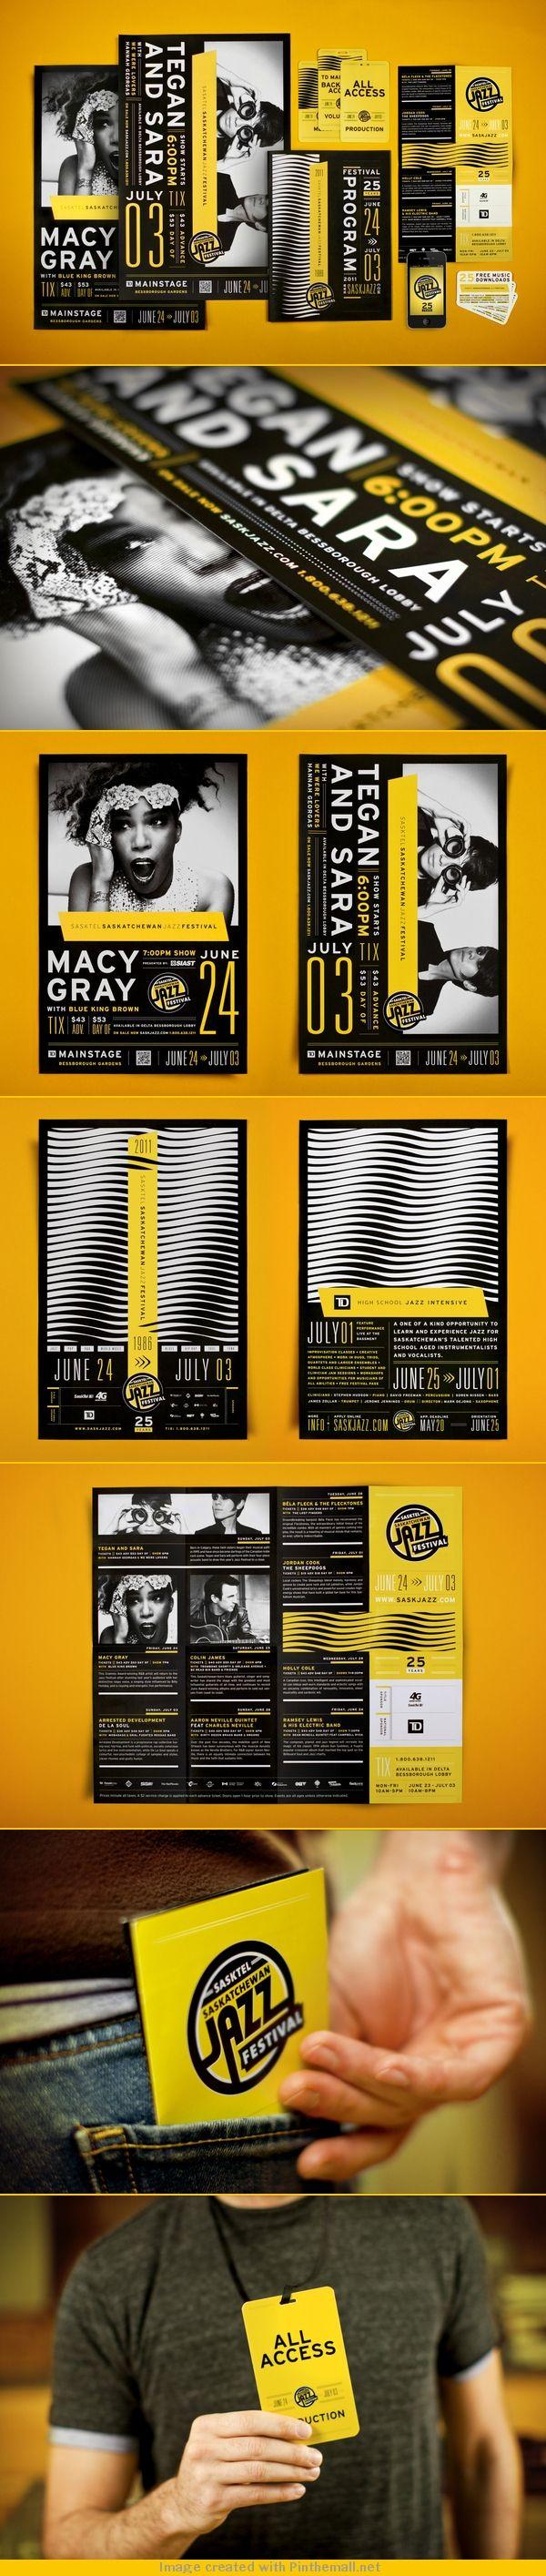 Saskatchewan Jazz Festival 2011 #typography #design #poster